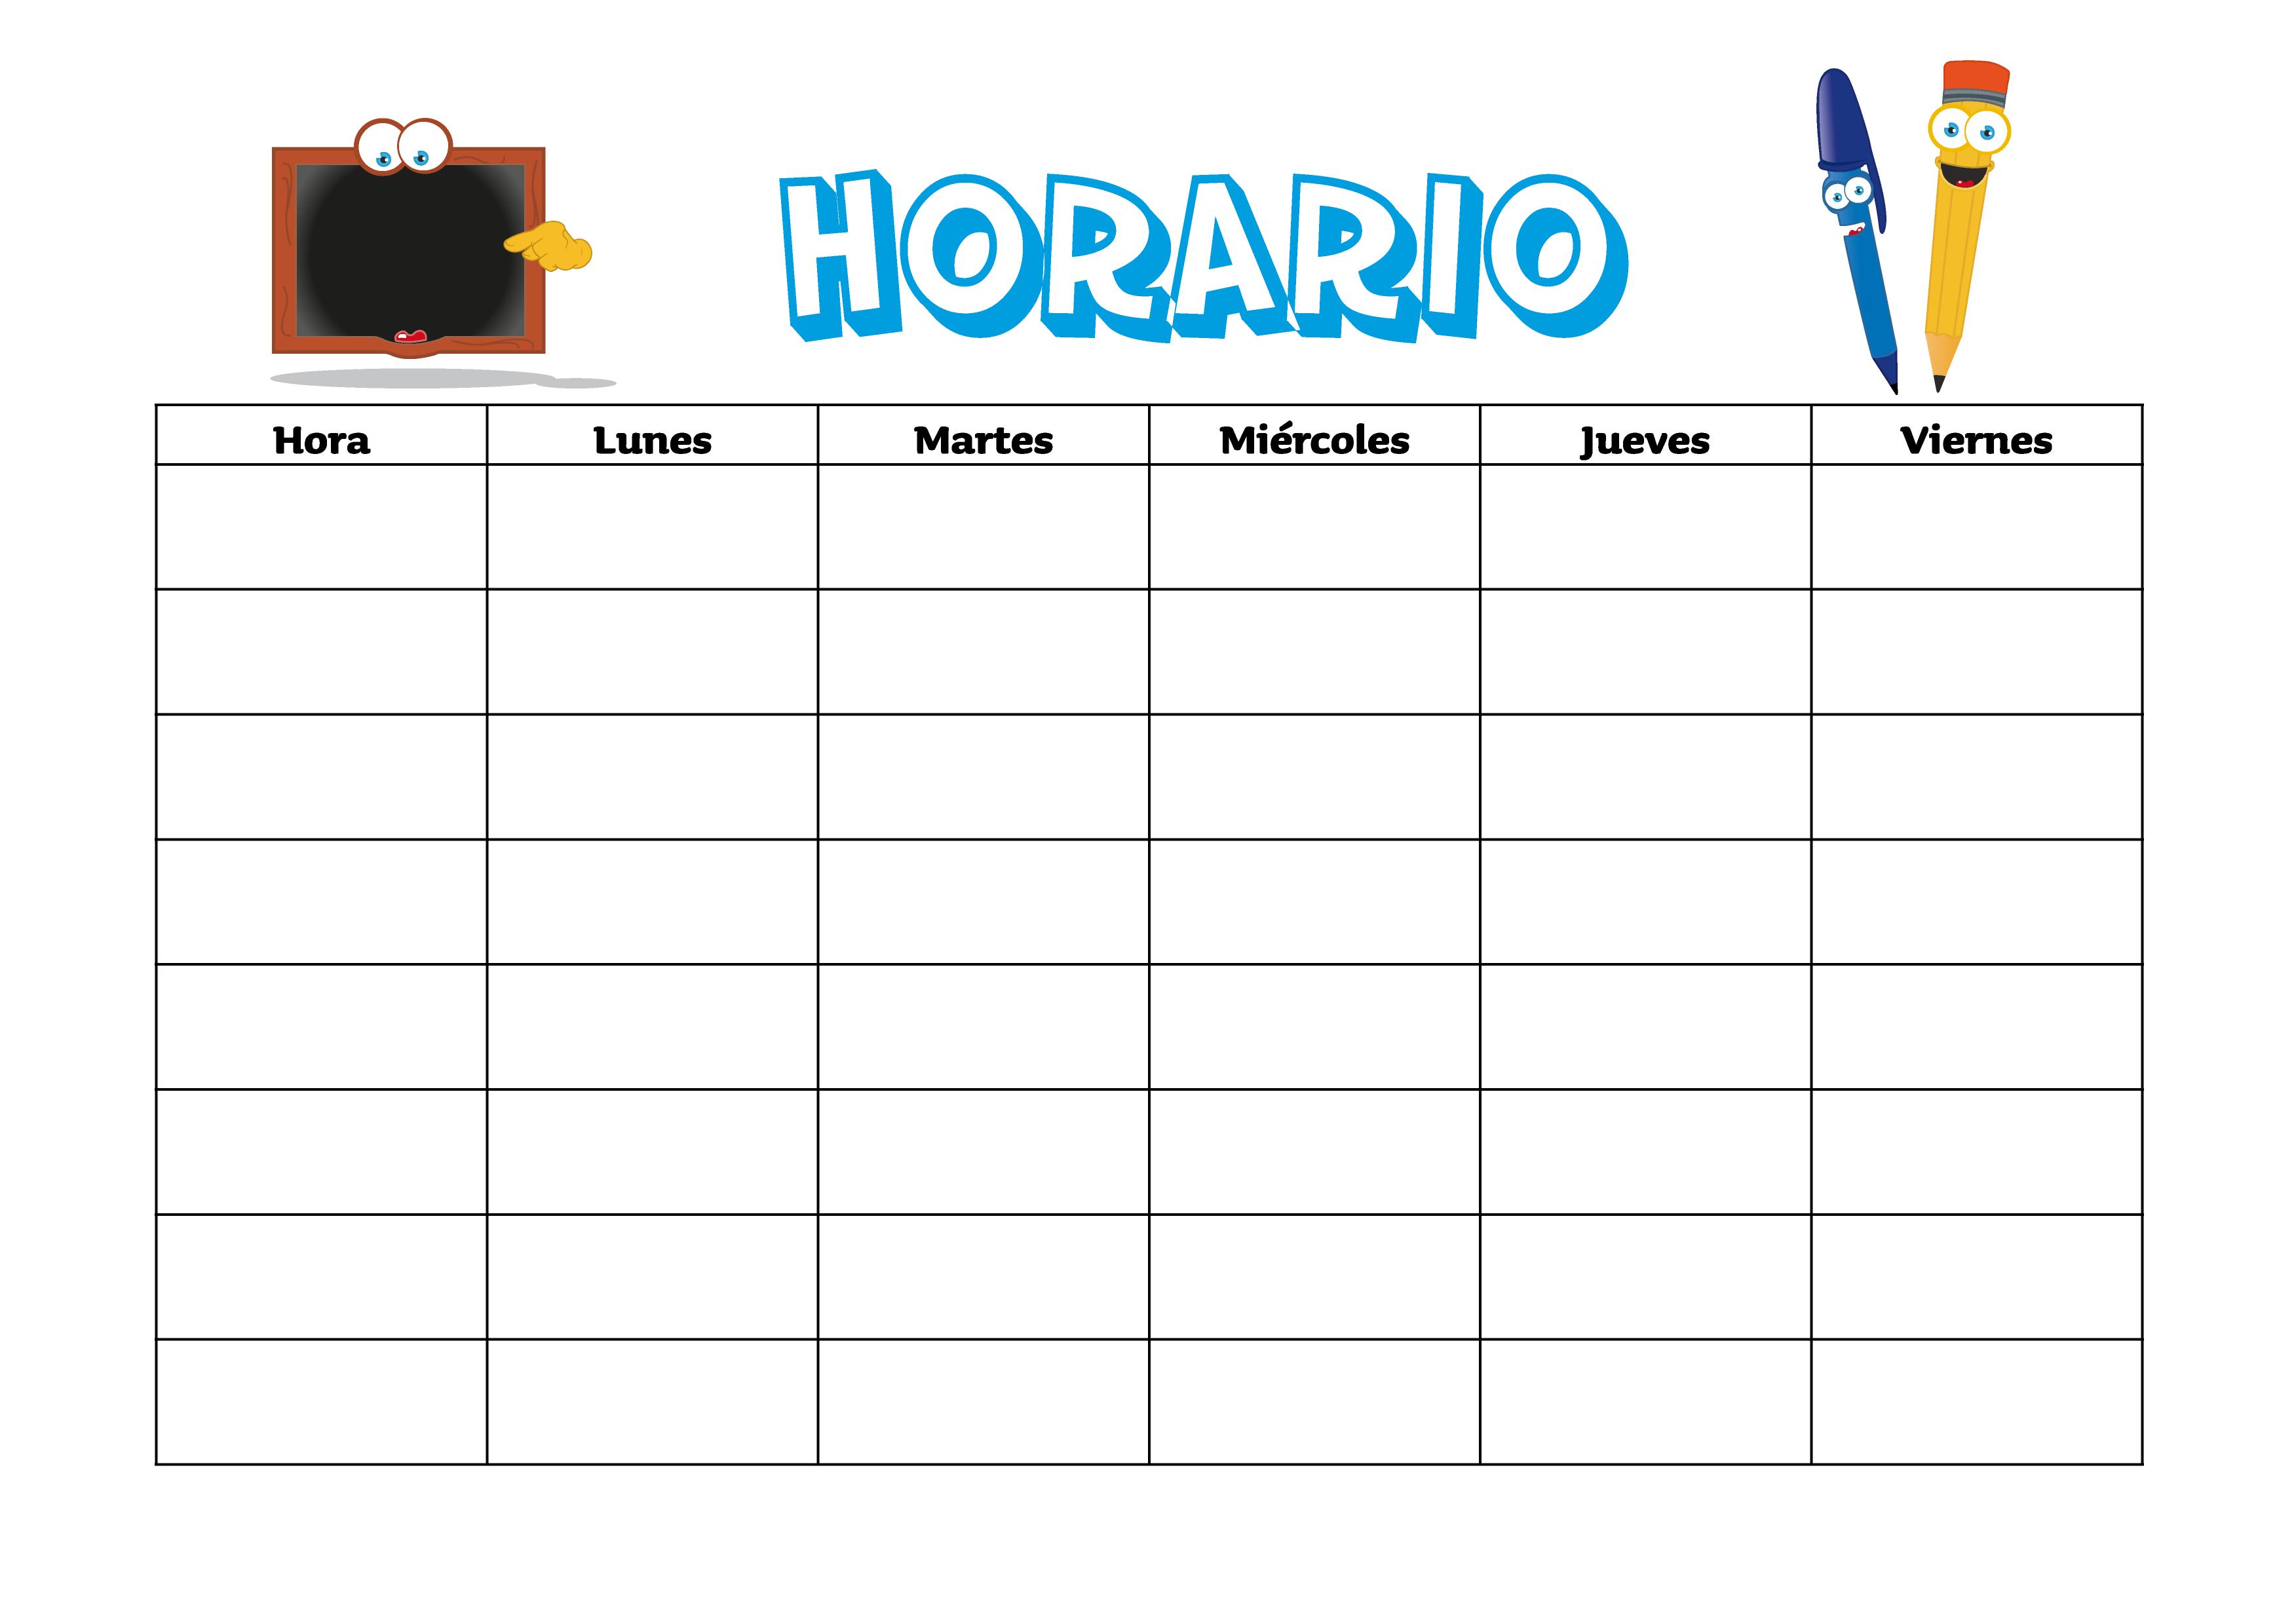 Imagenes Escolares Para Imprimir: Horario Para Estudiantes 1